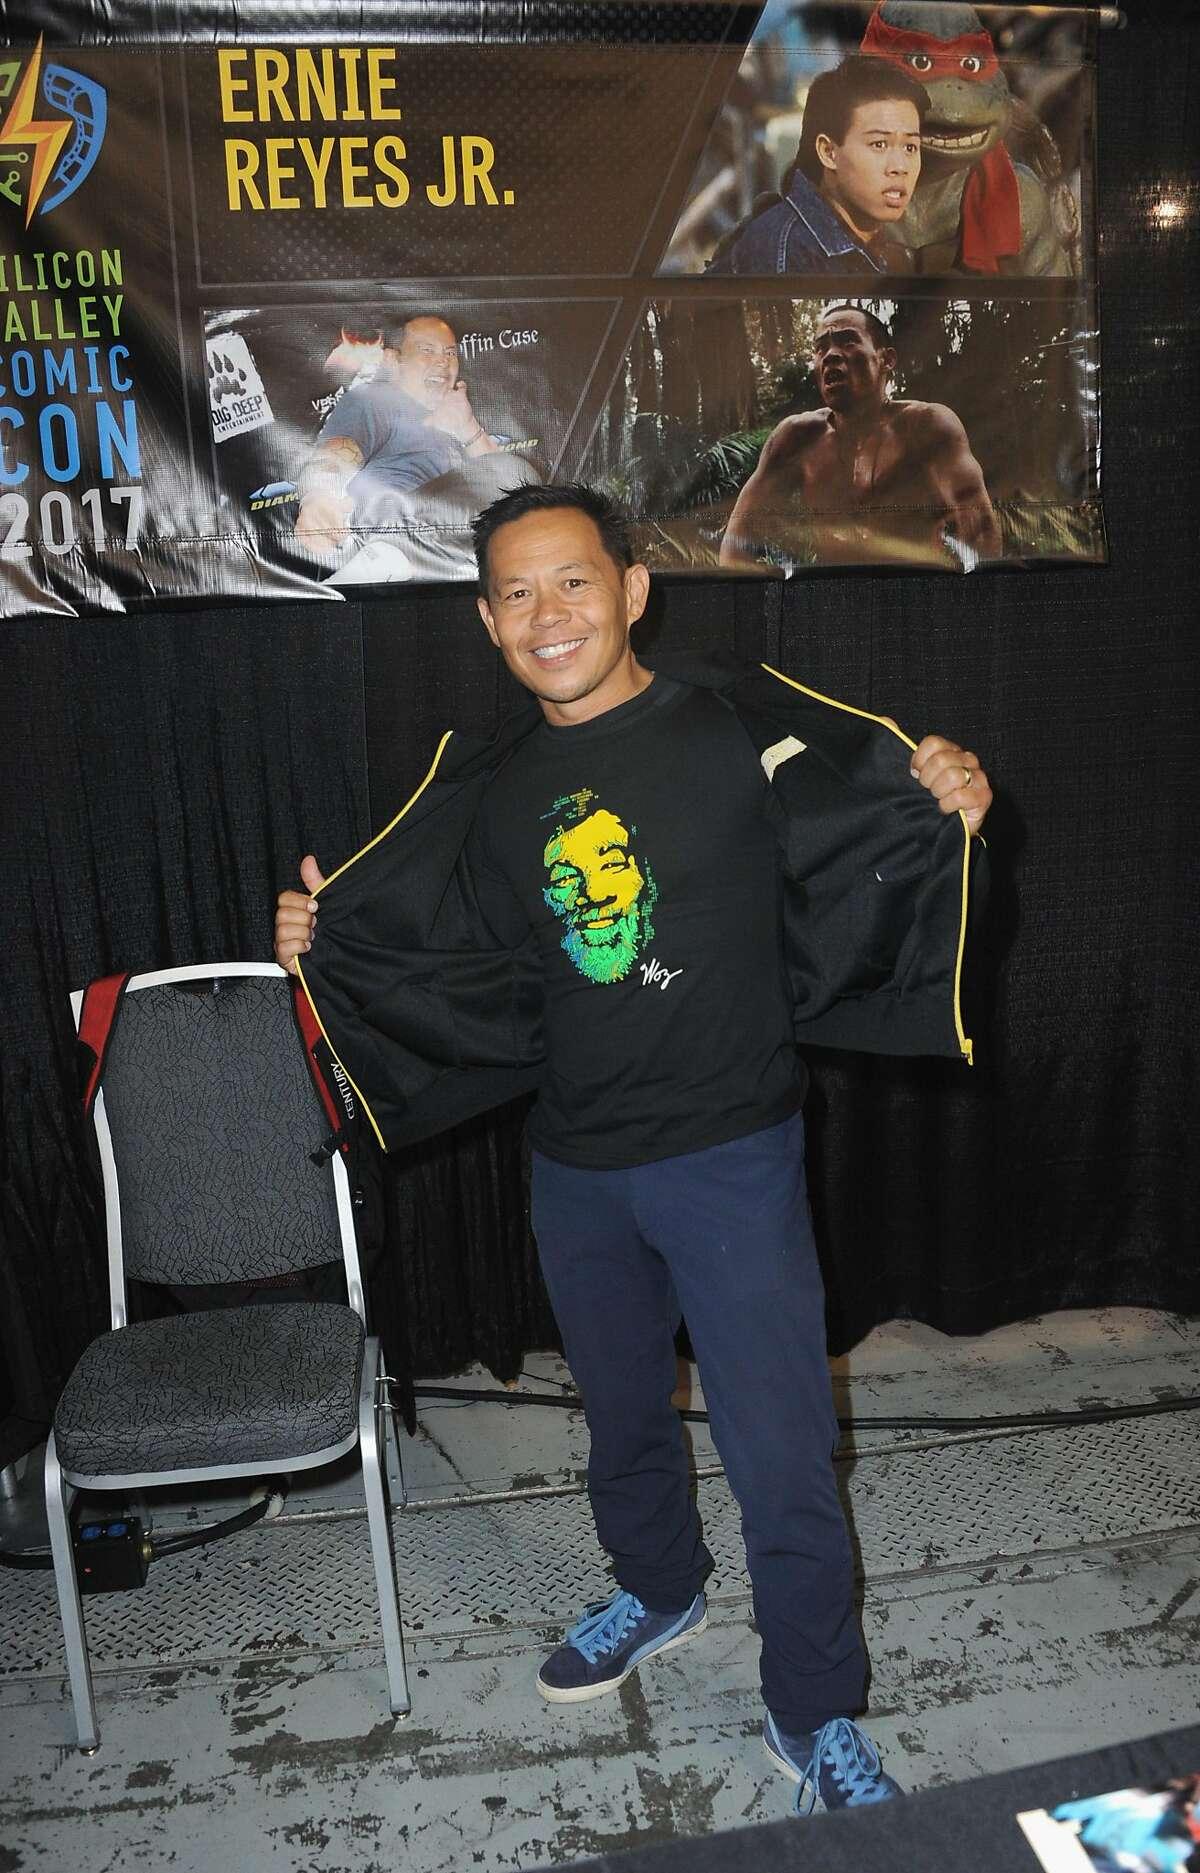 SAN JOSE, CA - APRIL 22: Actor Ernie Reyes Jr. Silicon Valley Comic Con 2017 held at San Jose Convention Center on April 22, 2017 in San Jose, California.